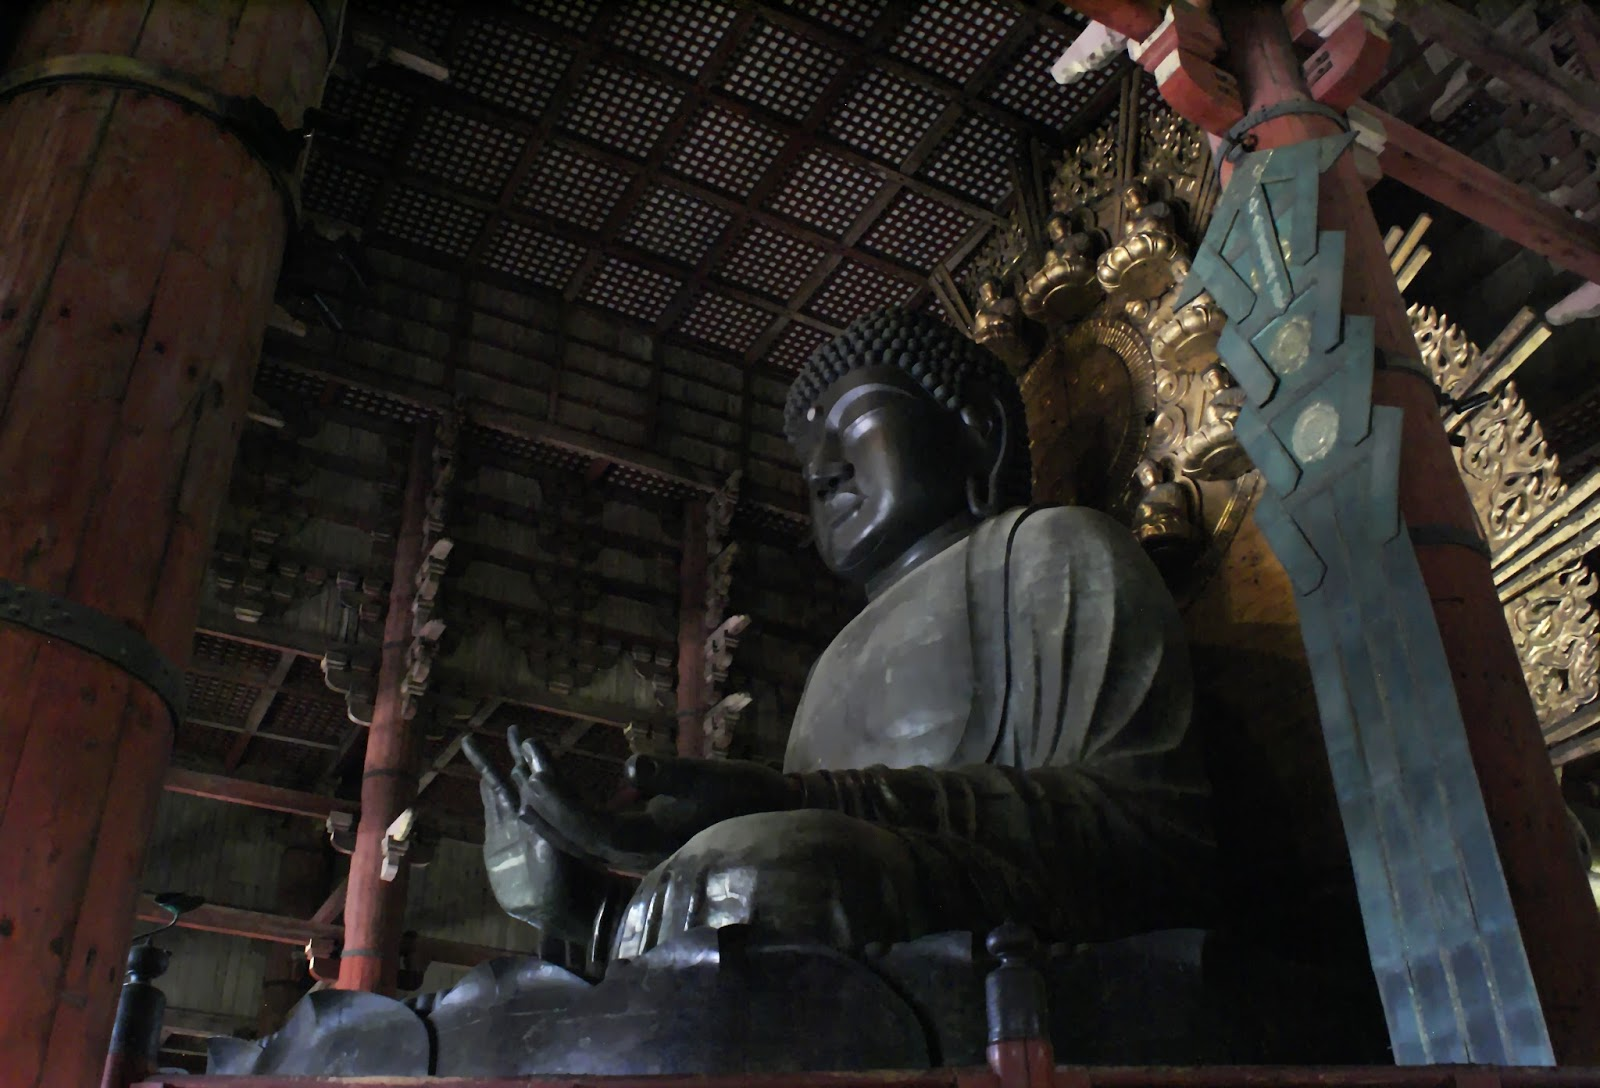 nara todai ji buddhist temple daibutsu buddha japan asia